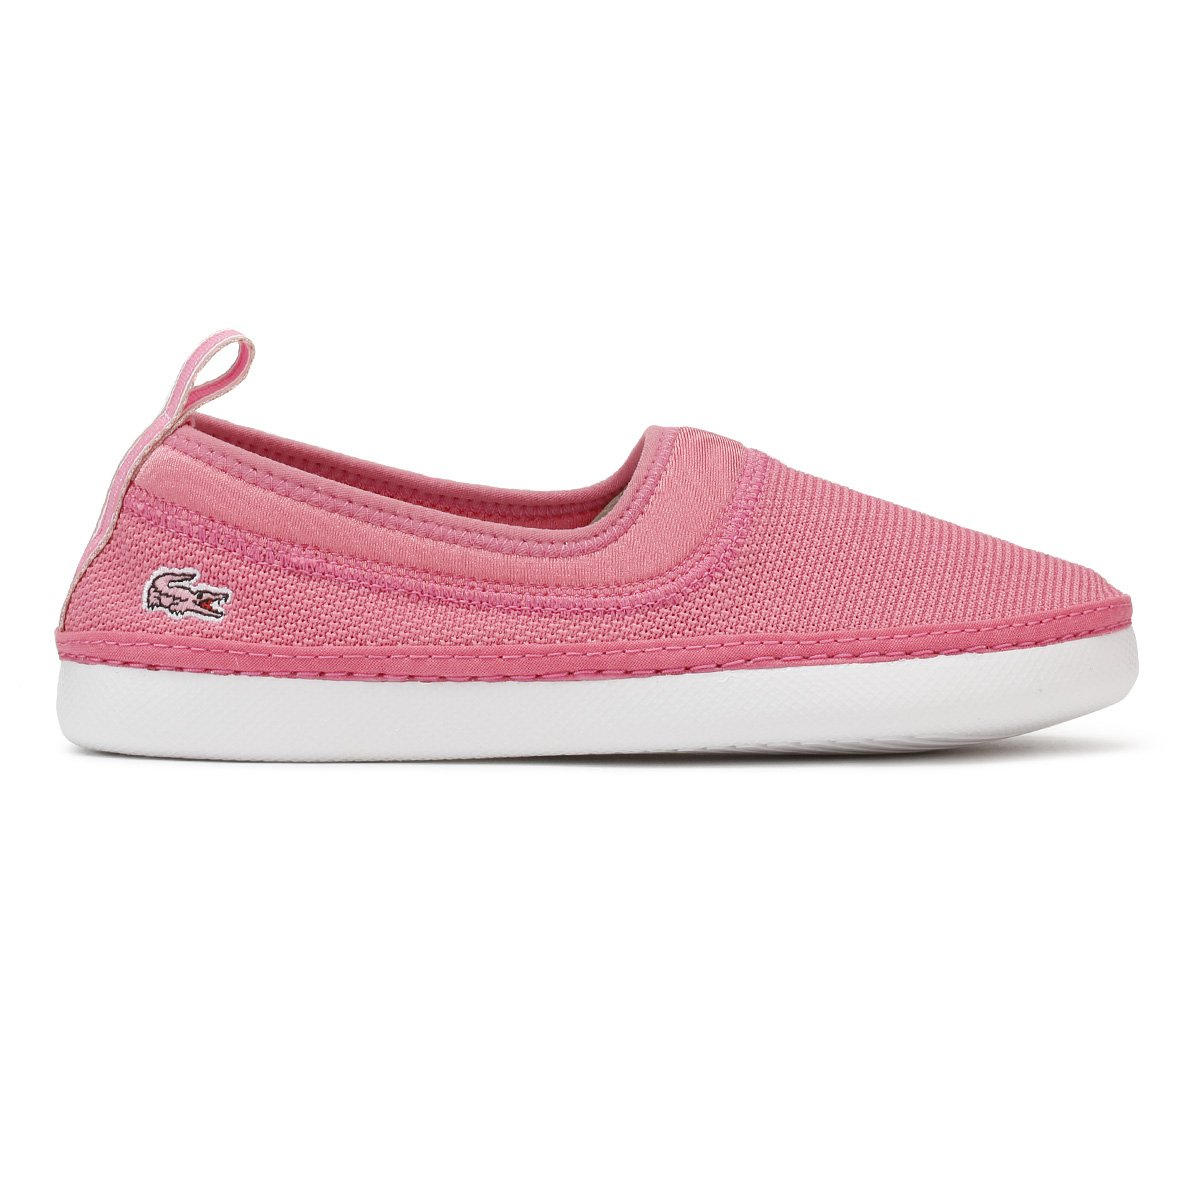 Lacoste Kids Pink//White L.YDRO 118 1 Espadrilles